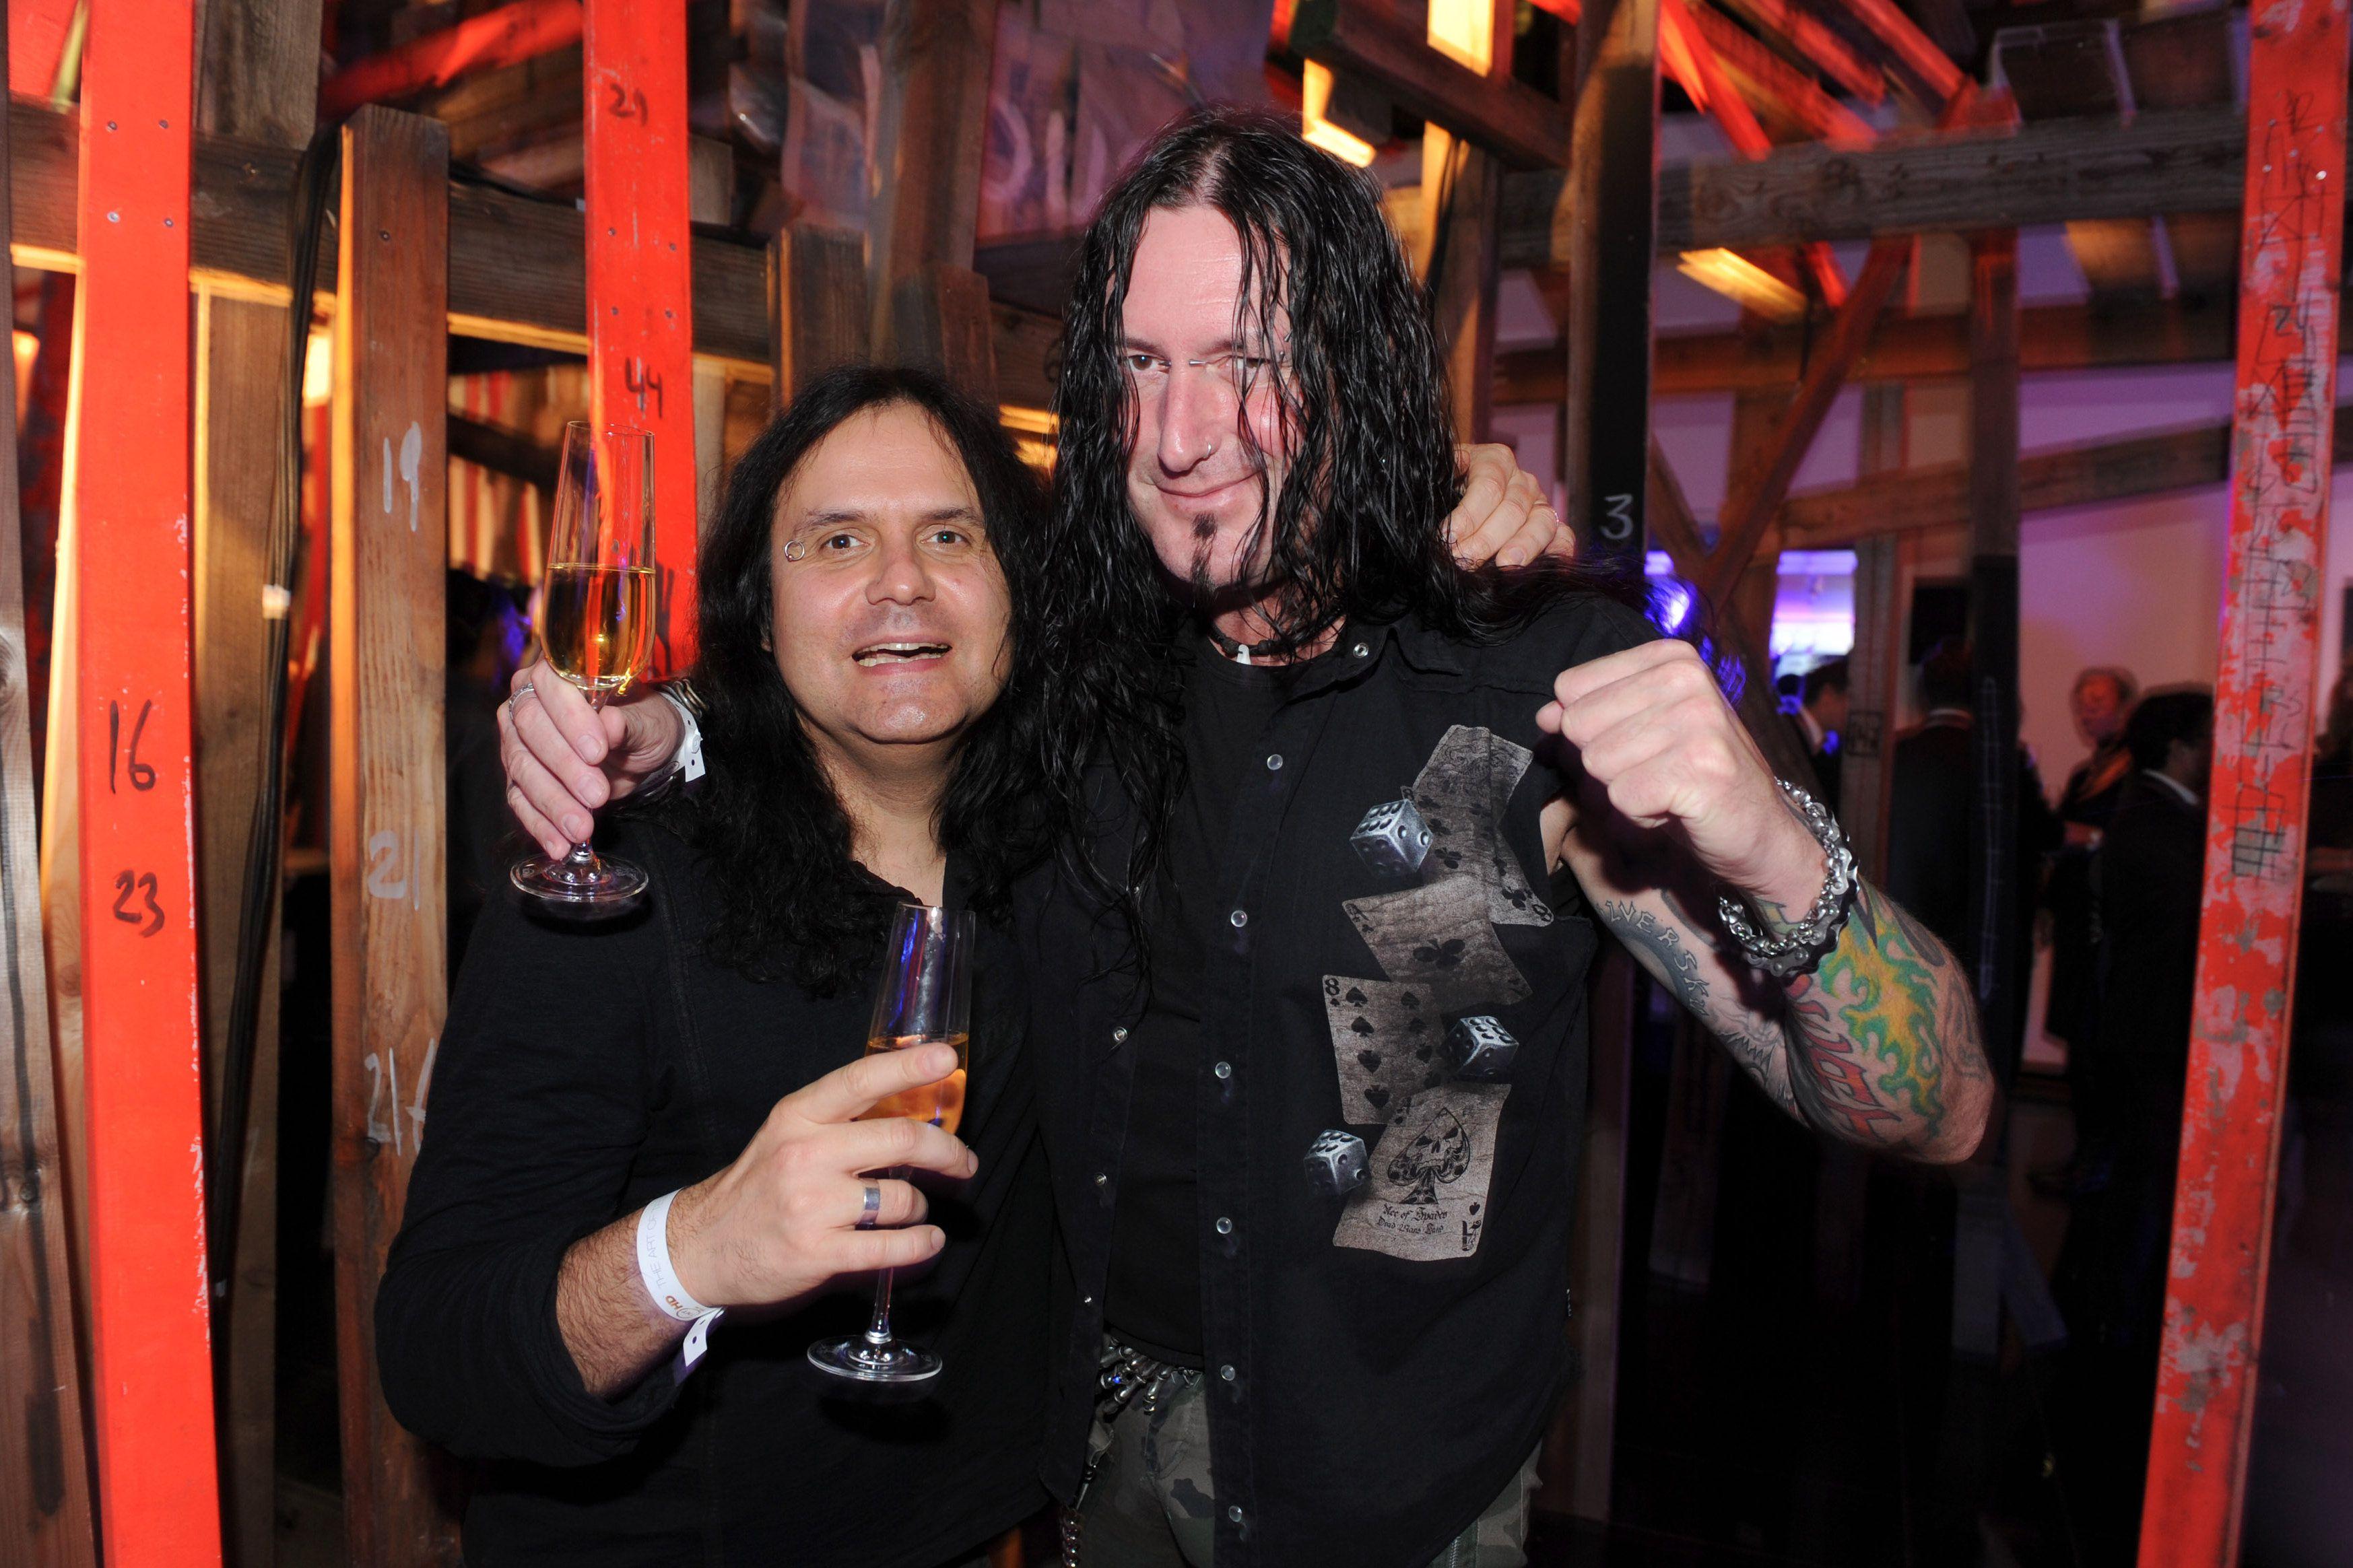 Musician Schmier of Destruction and musician Mille Petrozza of Kreator